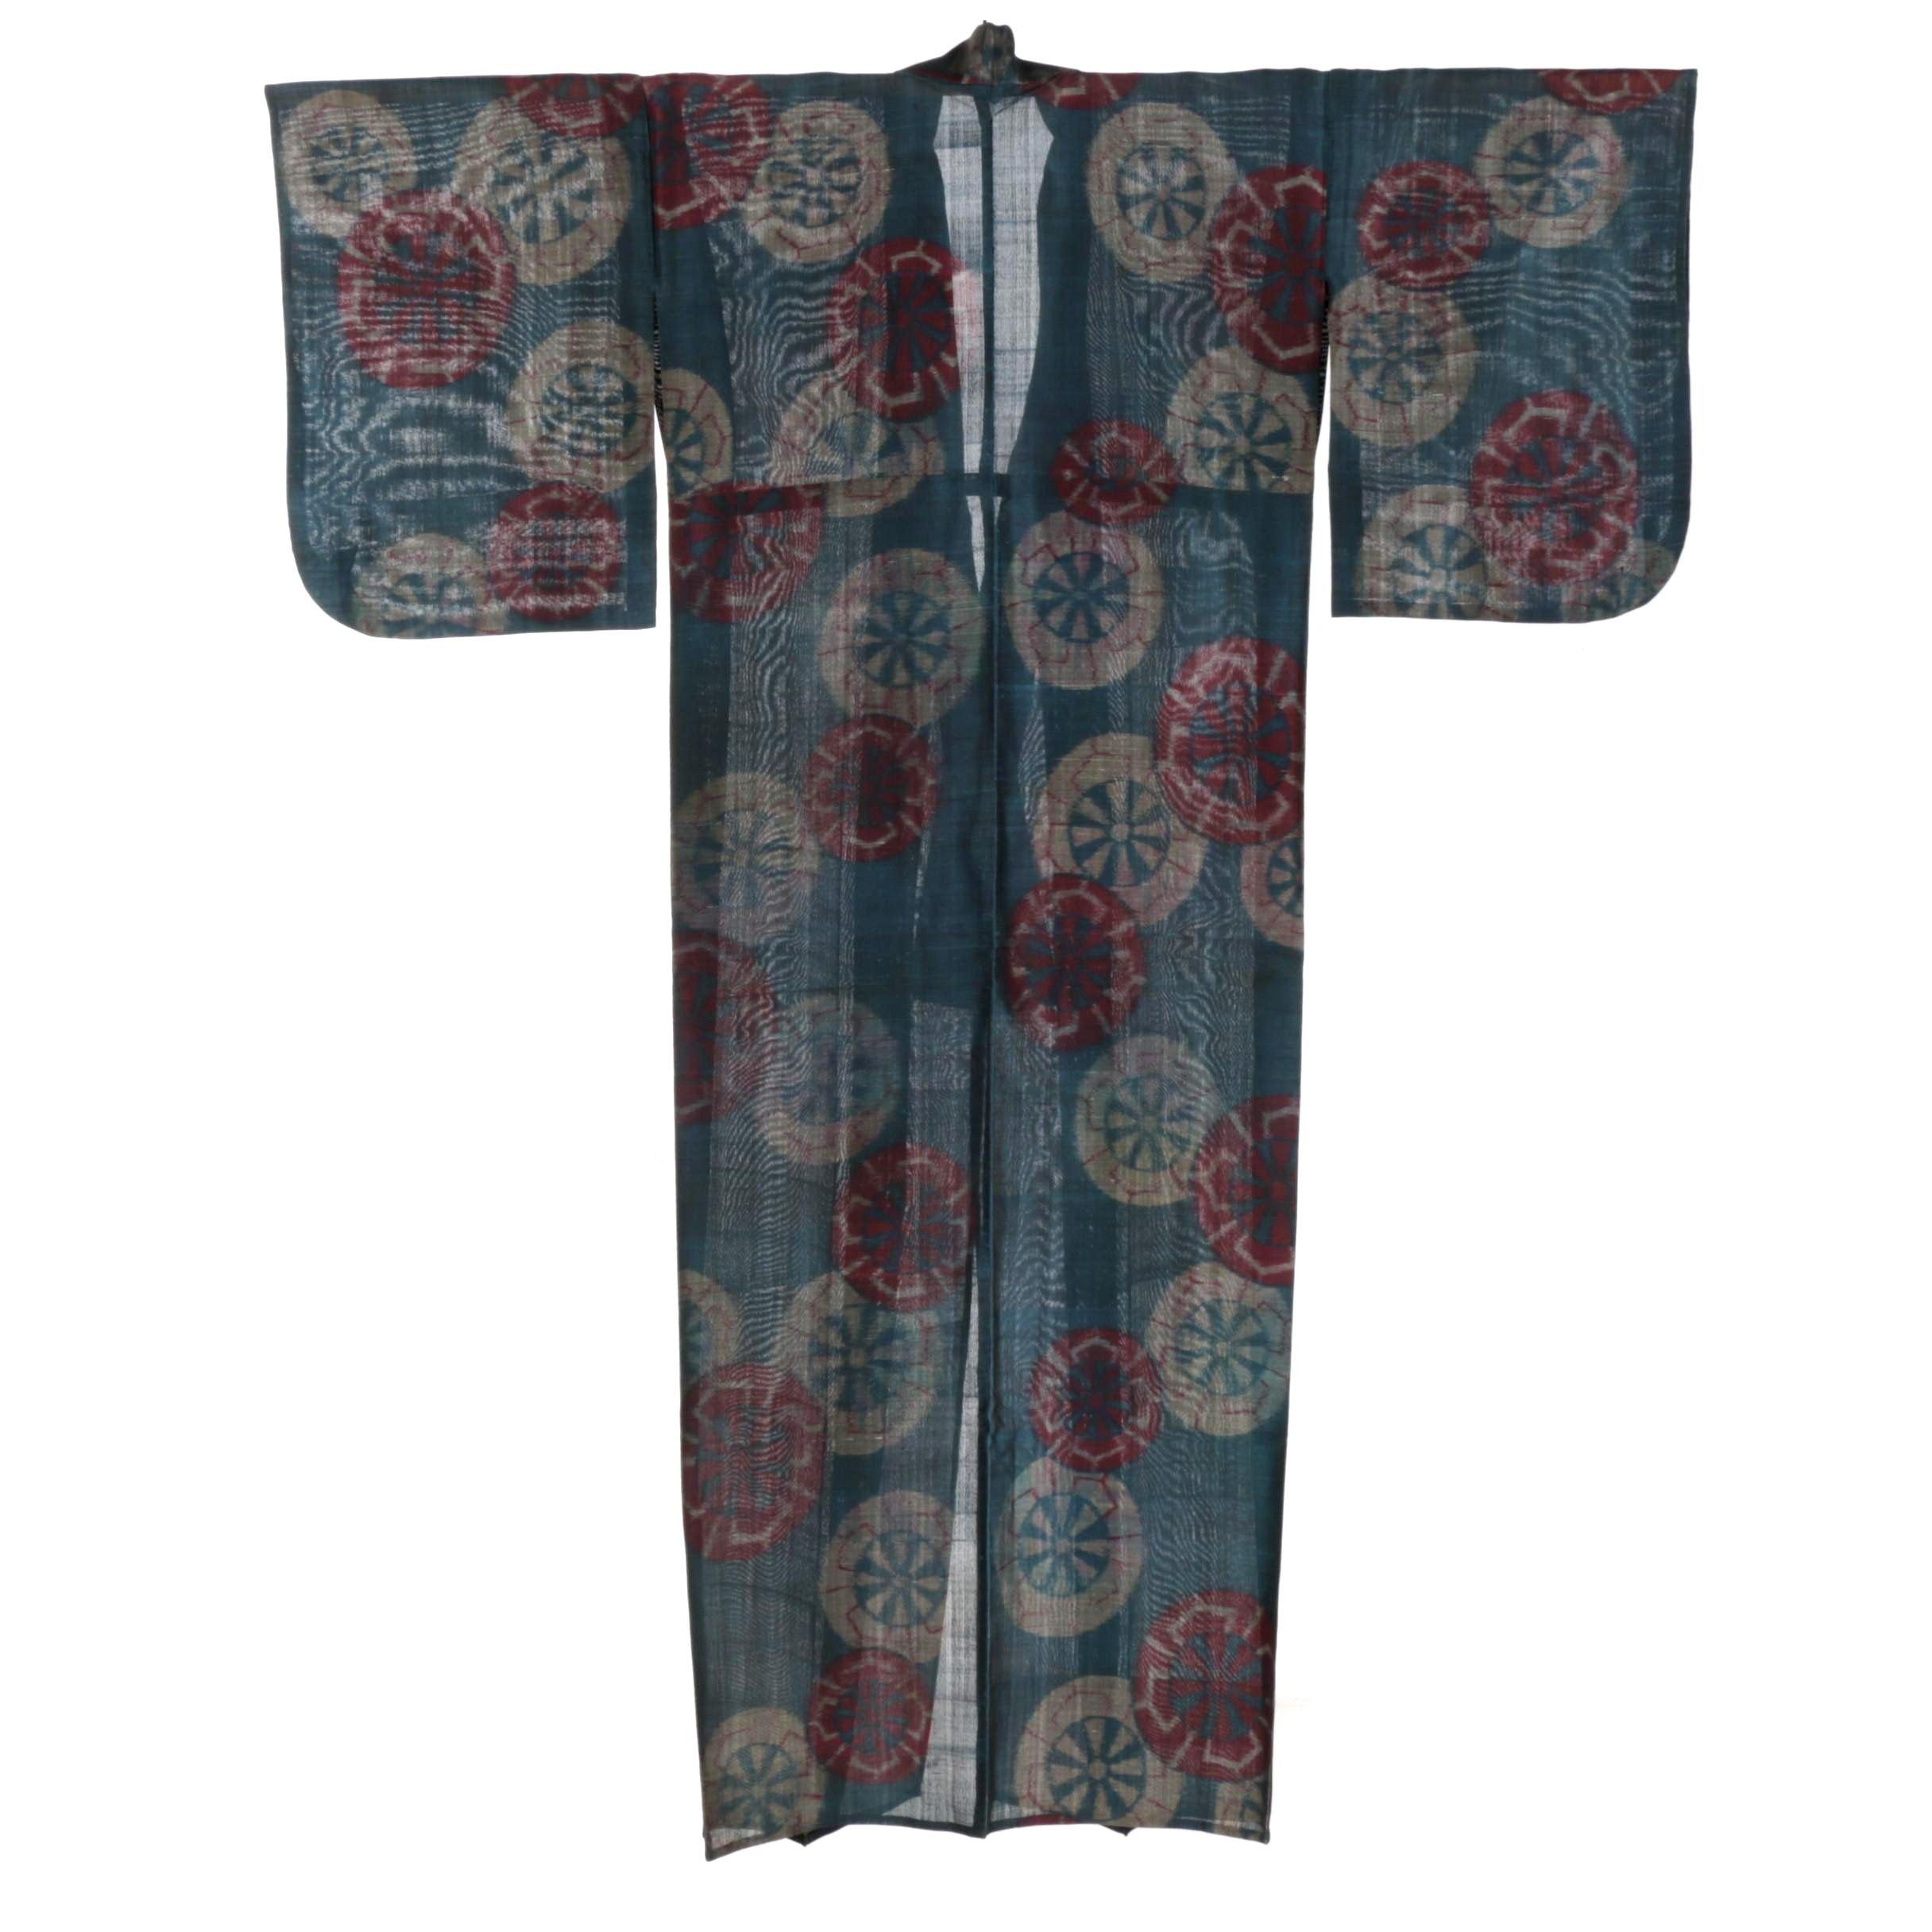 Circa 1920s Vintage Hand Sewn Silk Kimono